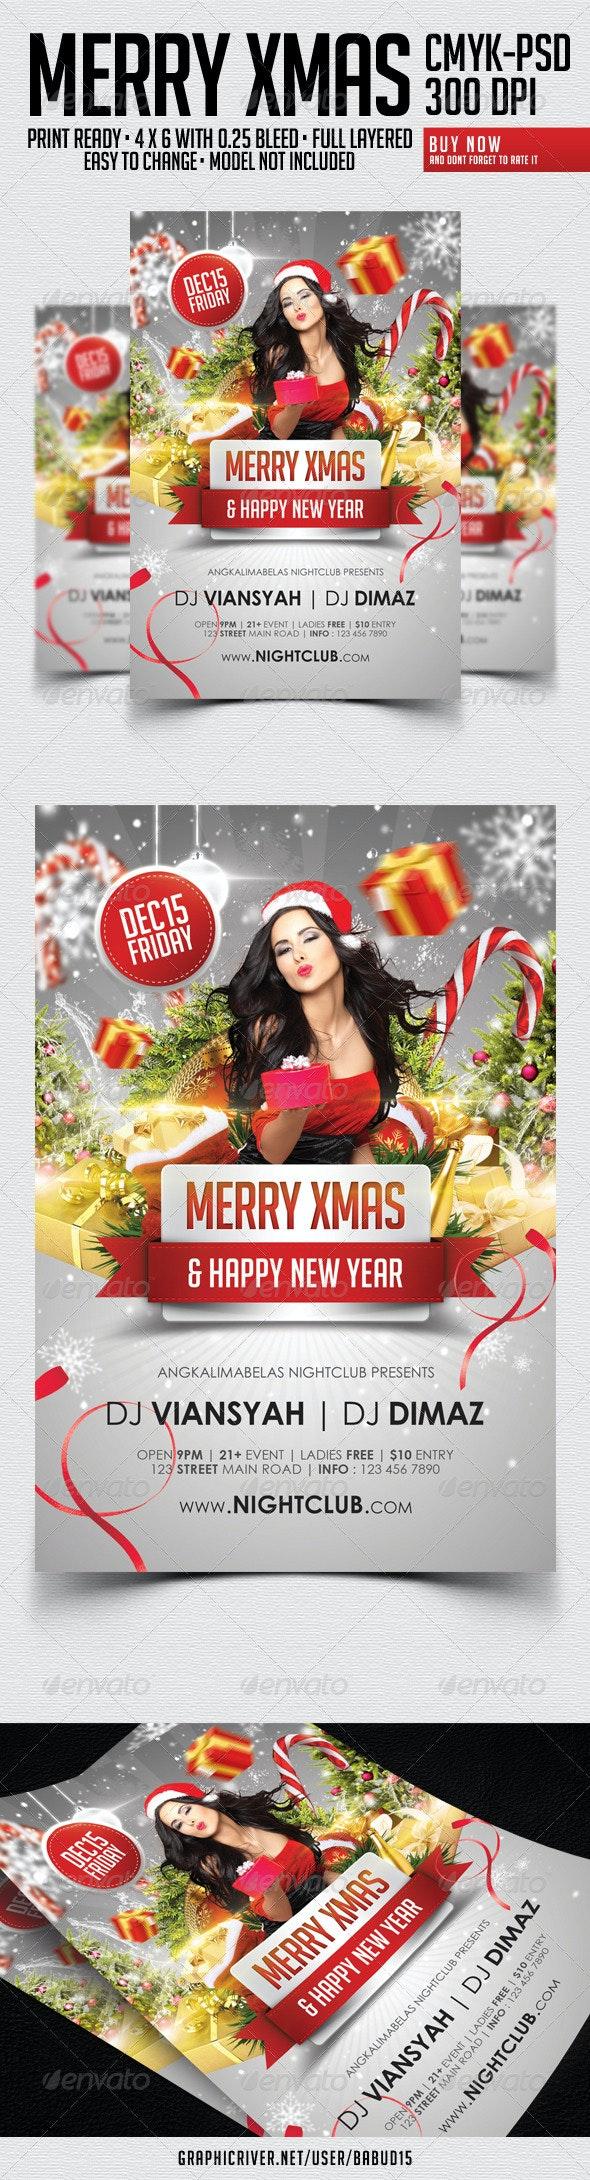 Merry Xmas Party Flyer - Events Flyers